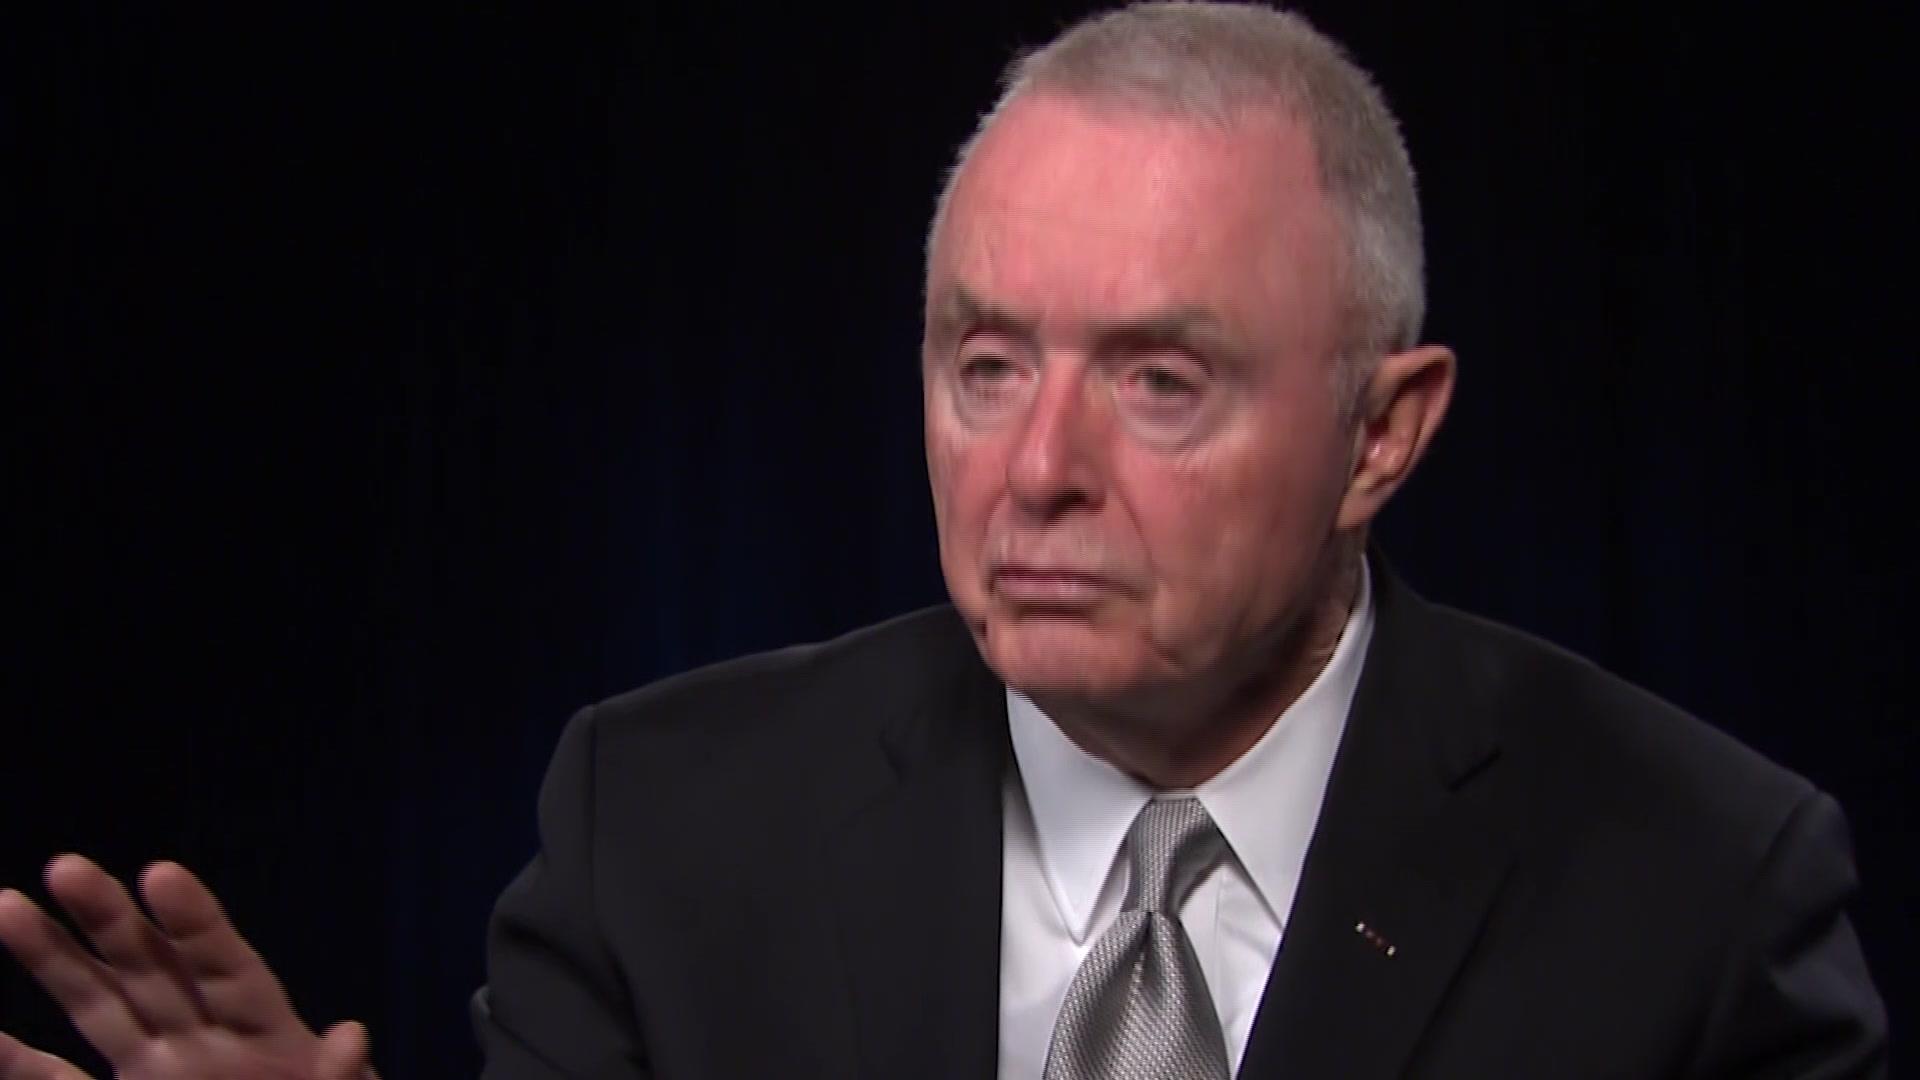 A civilian speaks against a dark background.